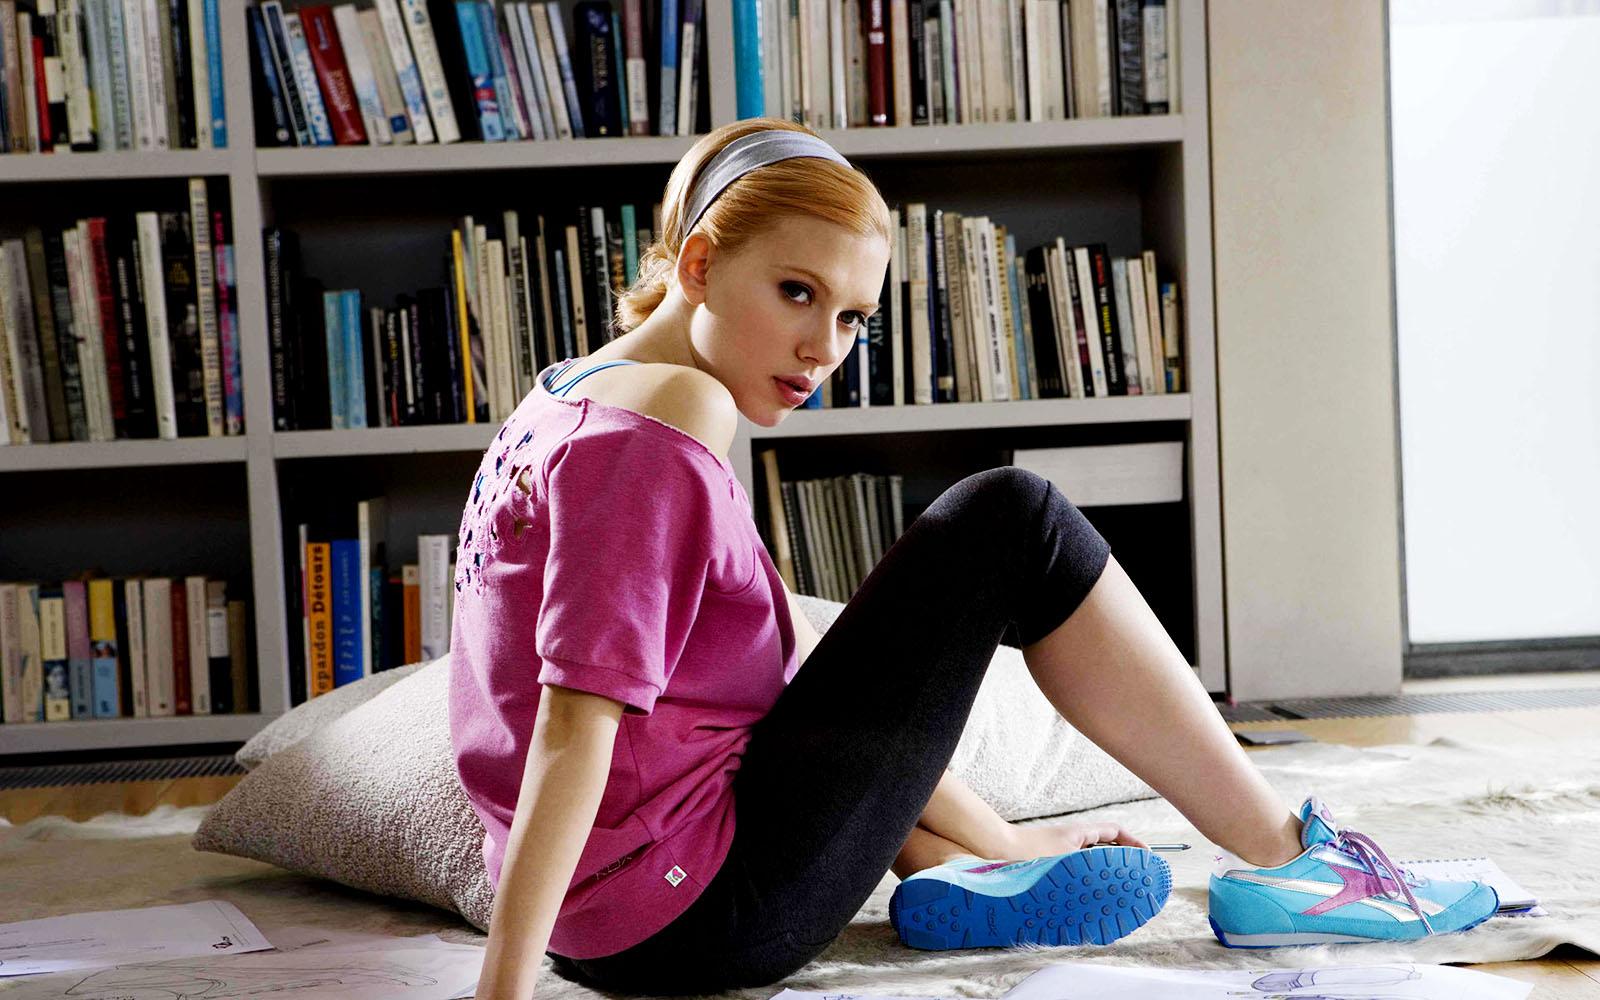 High Quality Hds Pics Of Scarlett Johansson As Redhead: HD WALLPAPERS: Scarlett Johansson HD Wallpapers